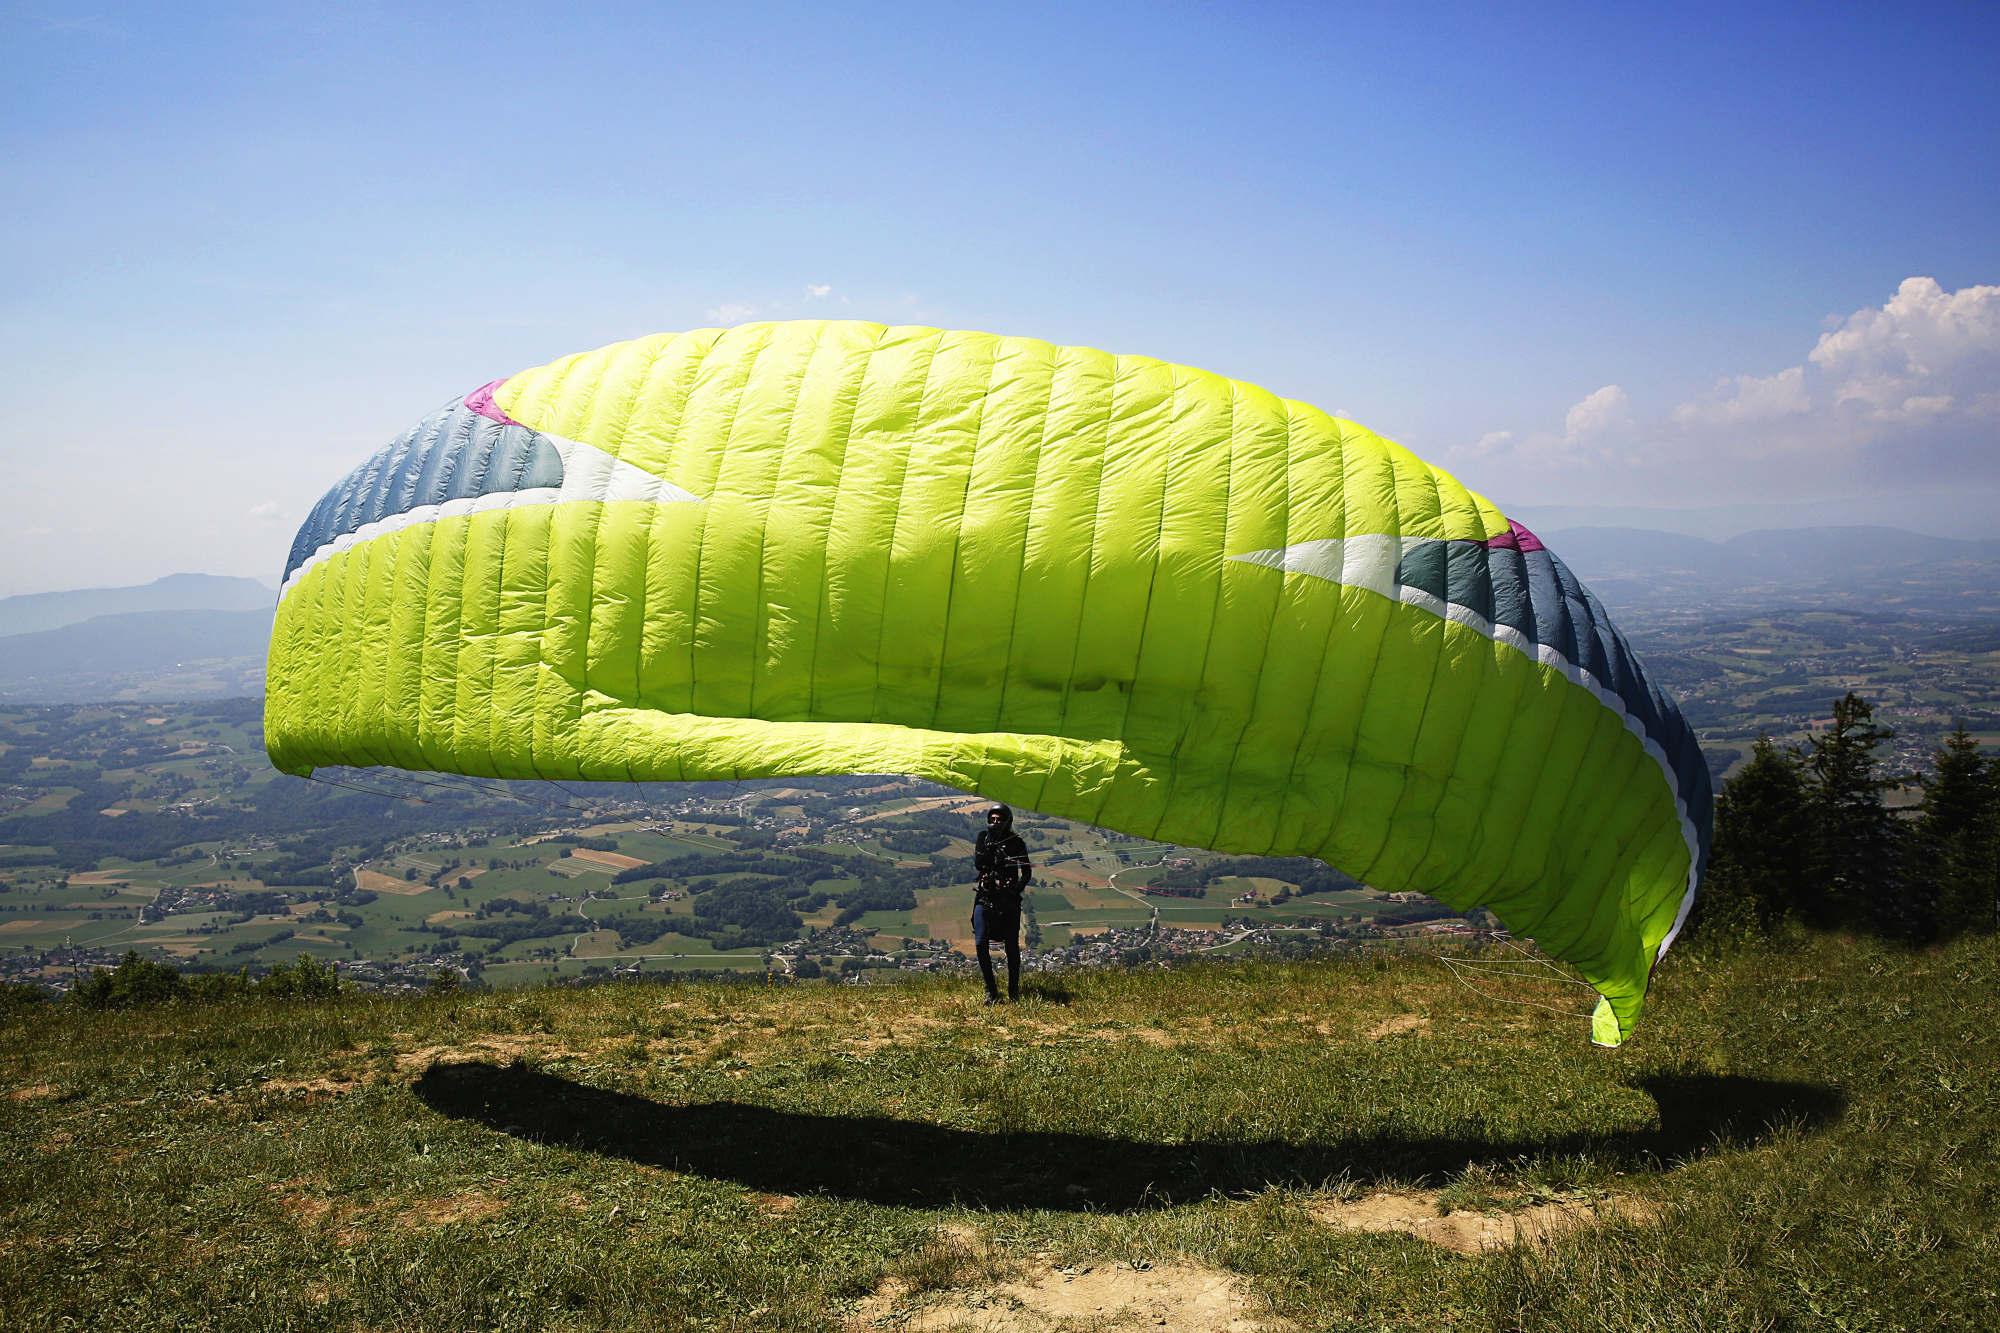 Biologist, Paraglider, Annecy, France - RiverFlowsThroughIt